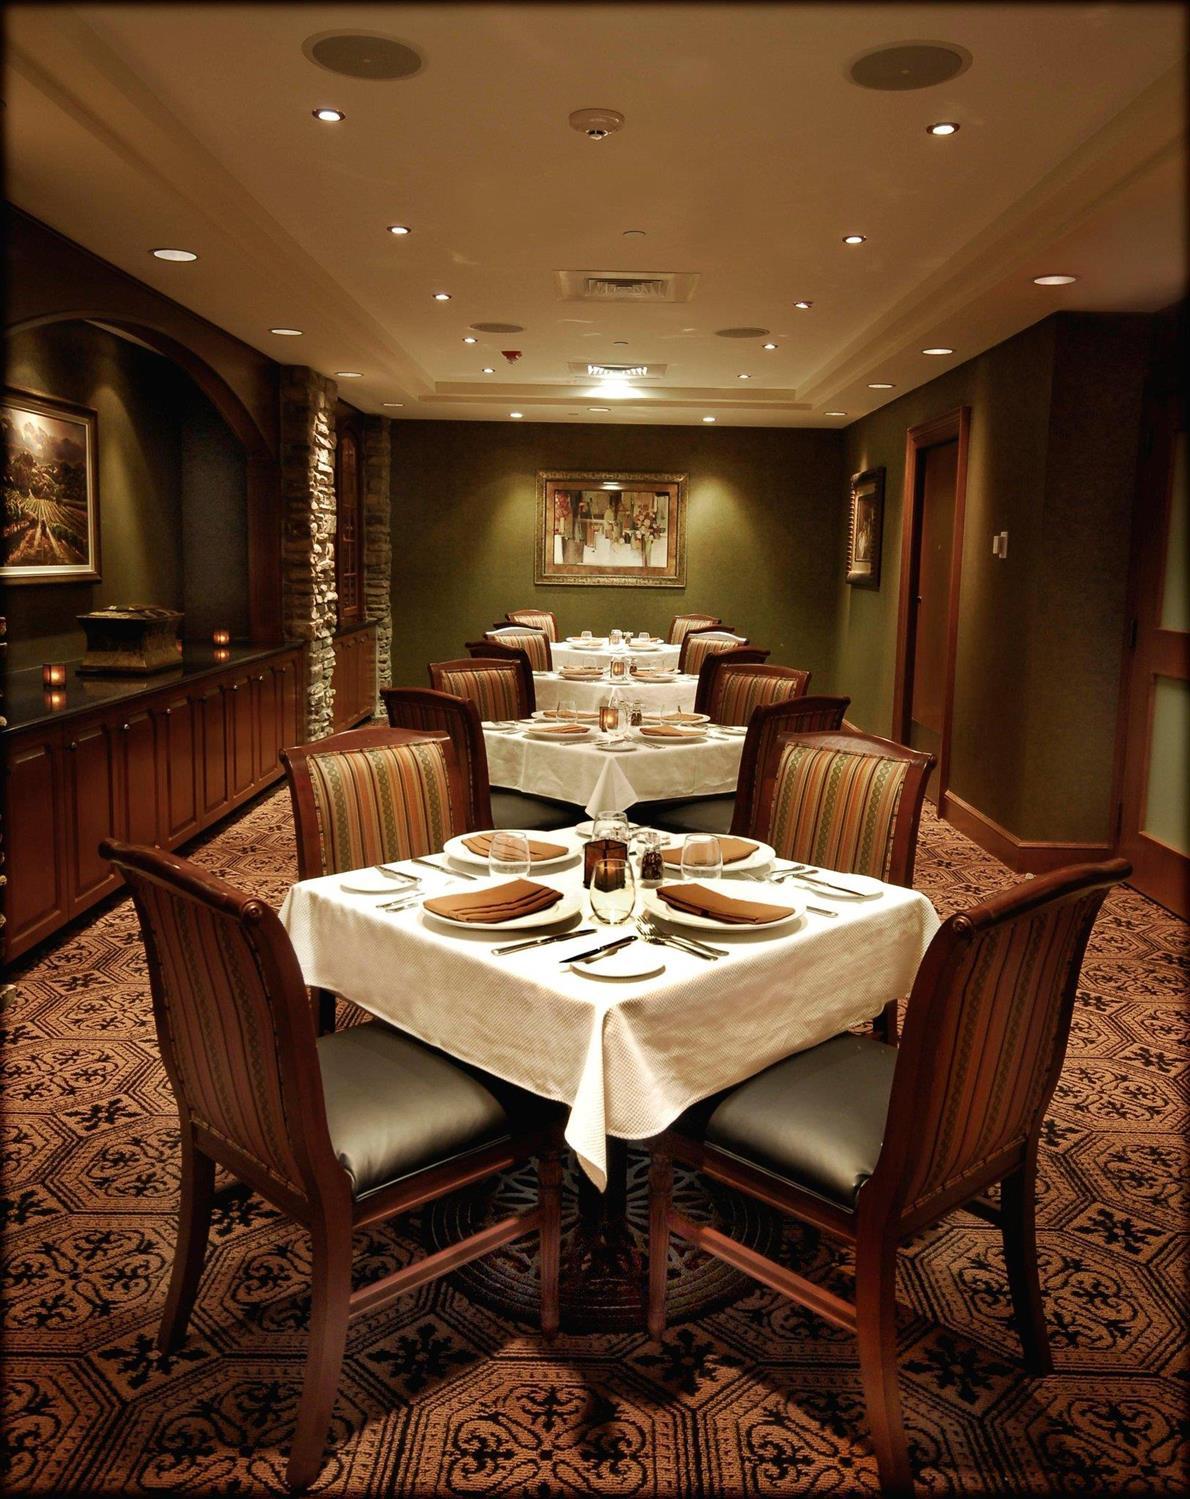 Restaurant - Clinton Inn Hotel Tenafly